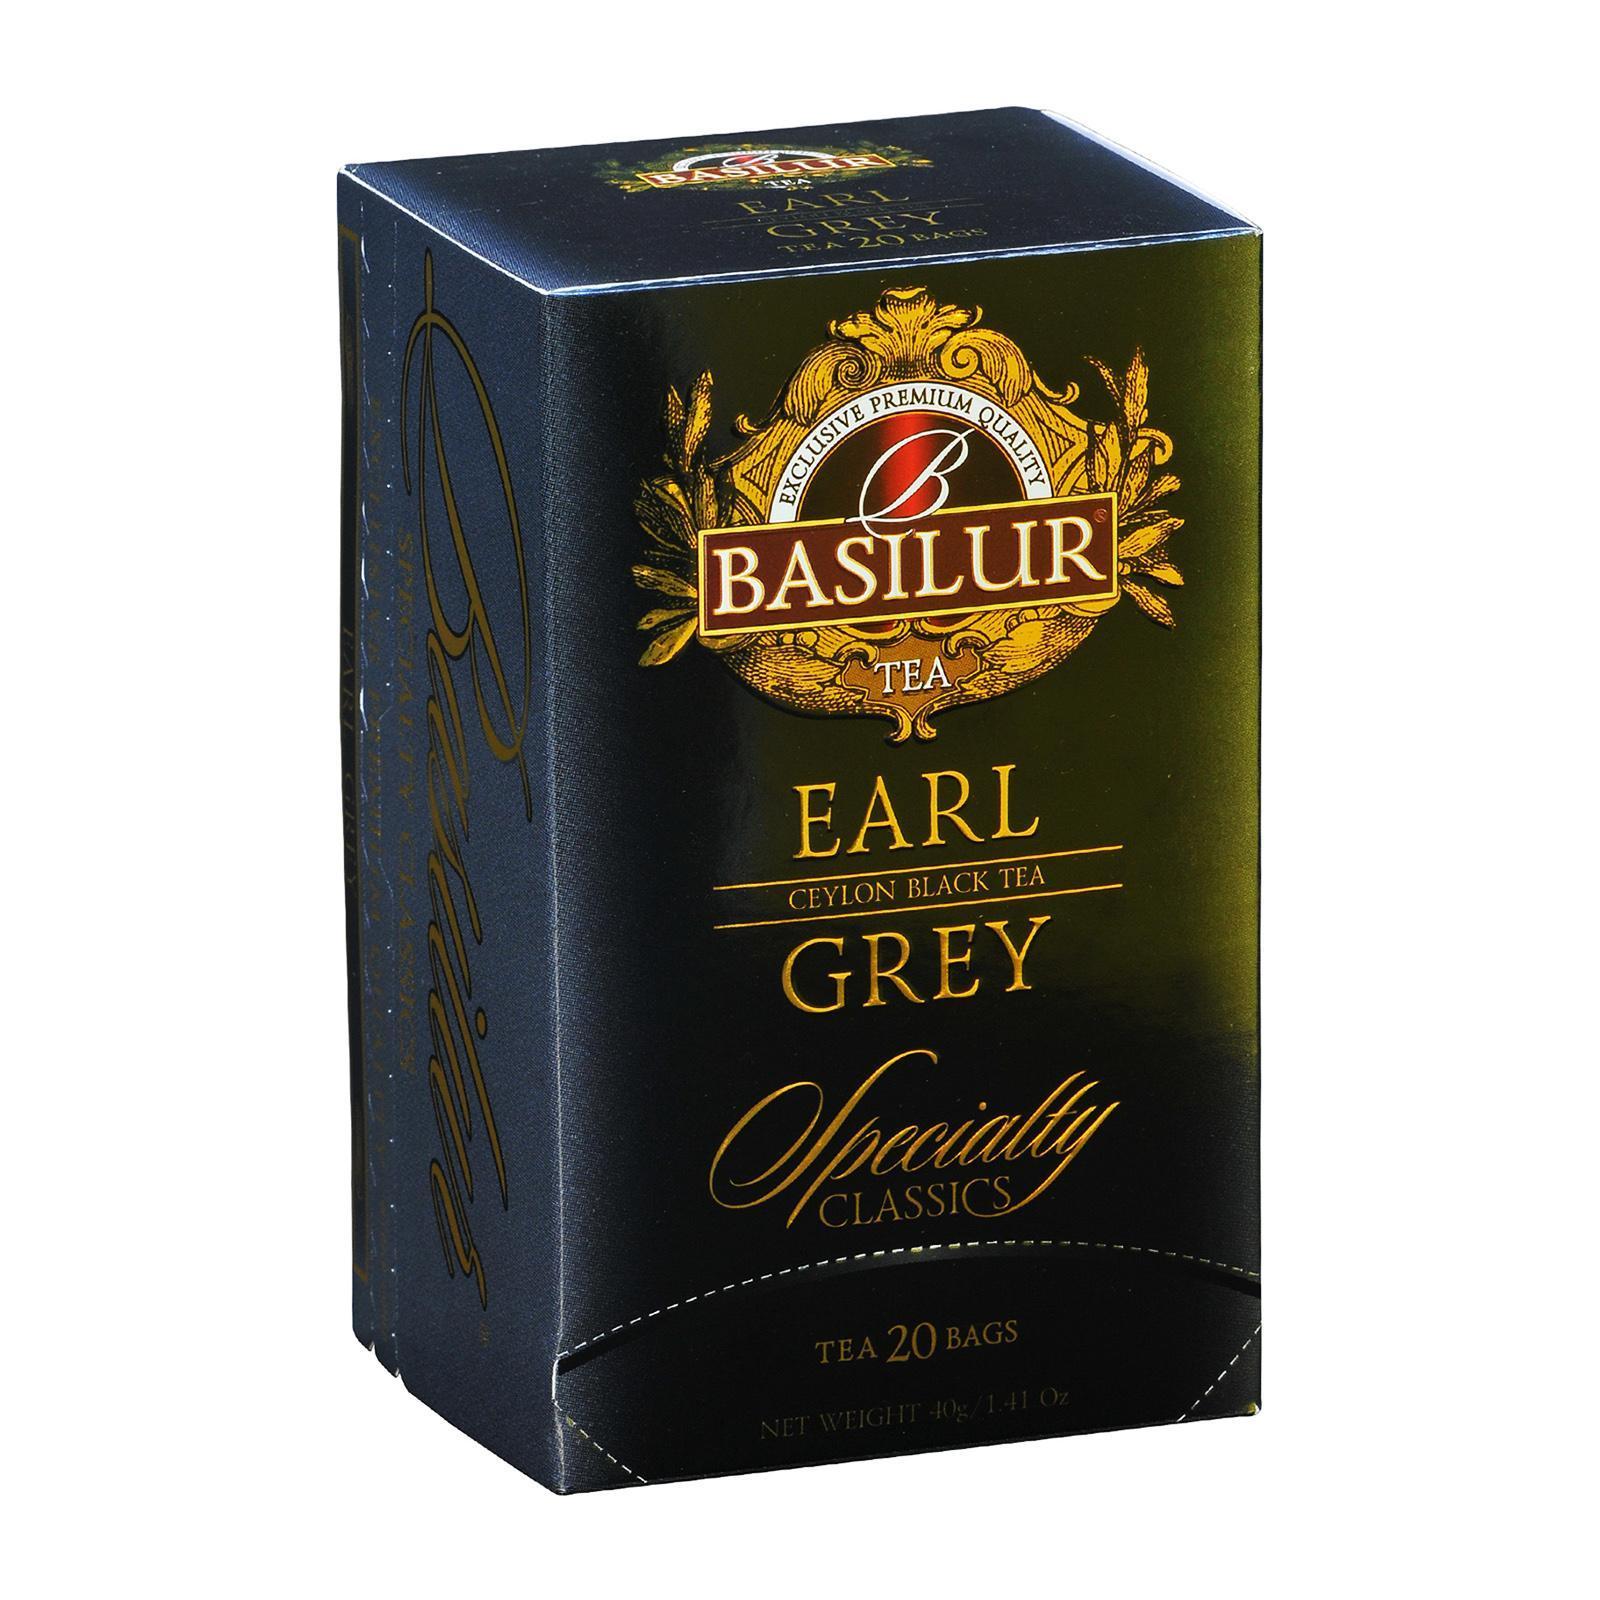 Basilur Tea Specialty Classics Earl Grey Tea